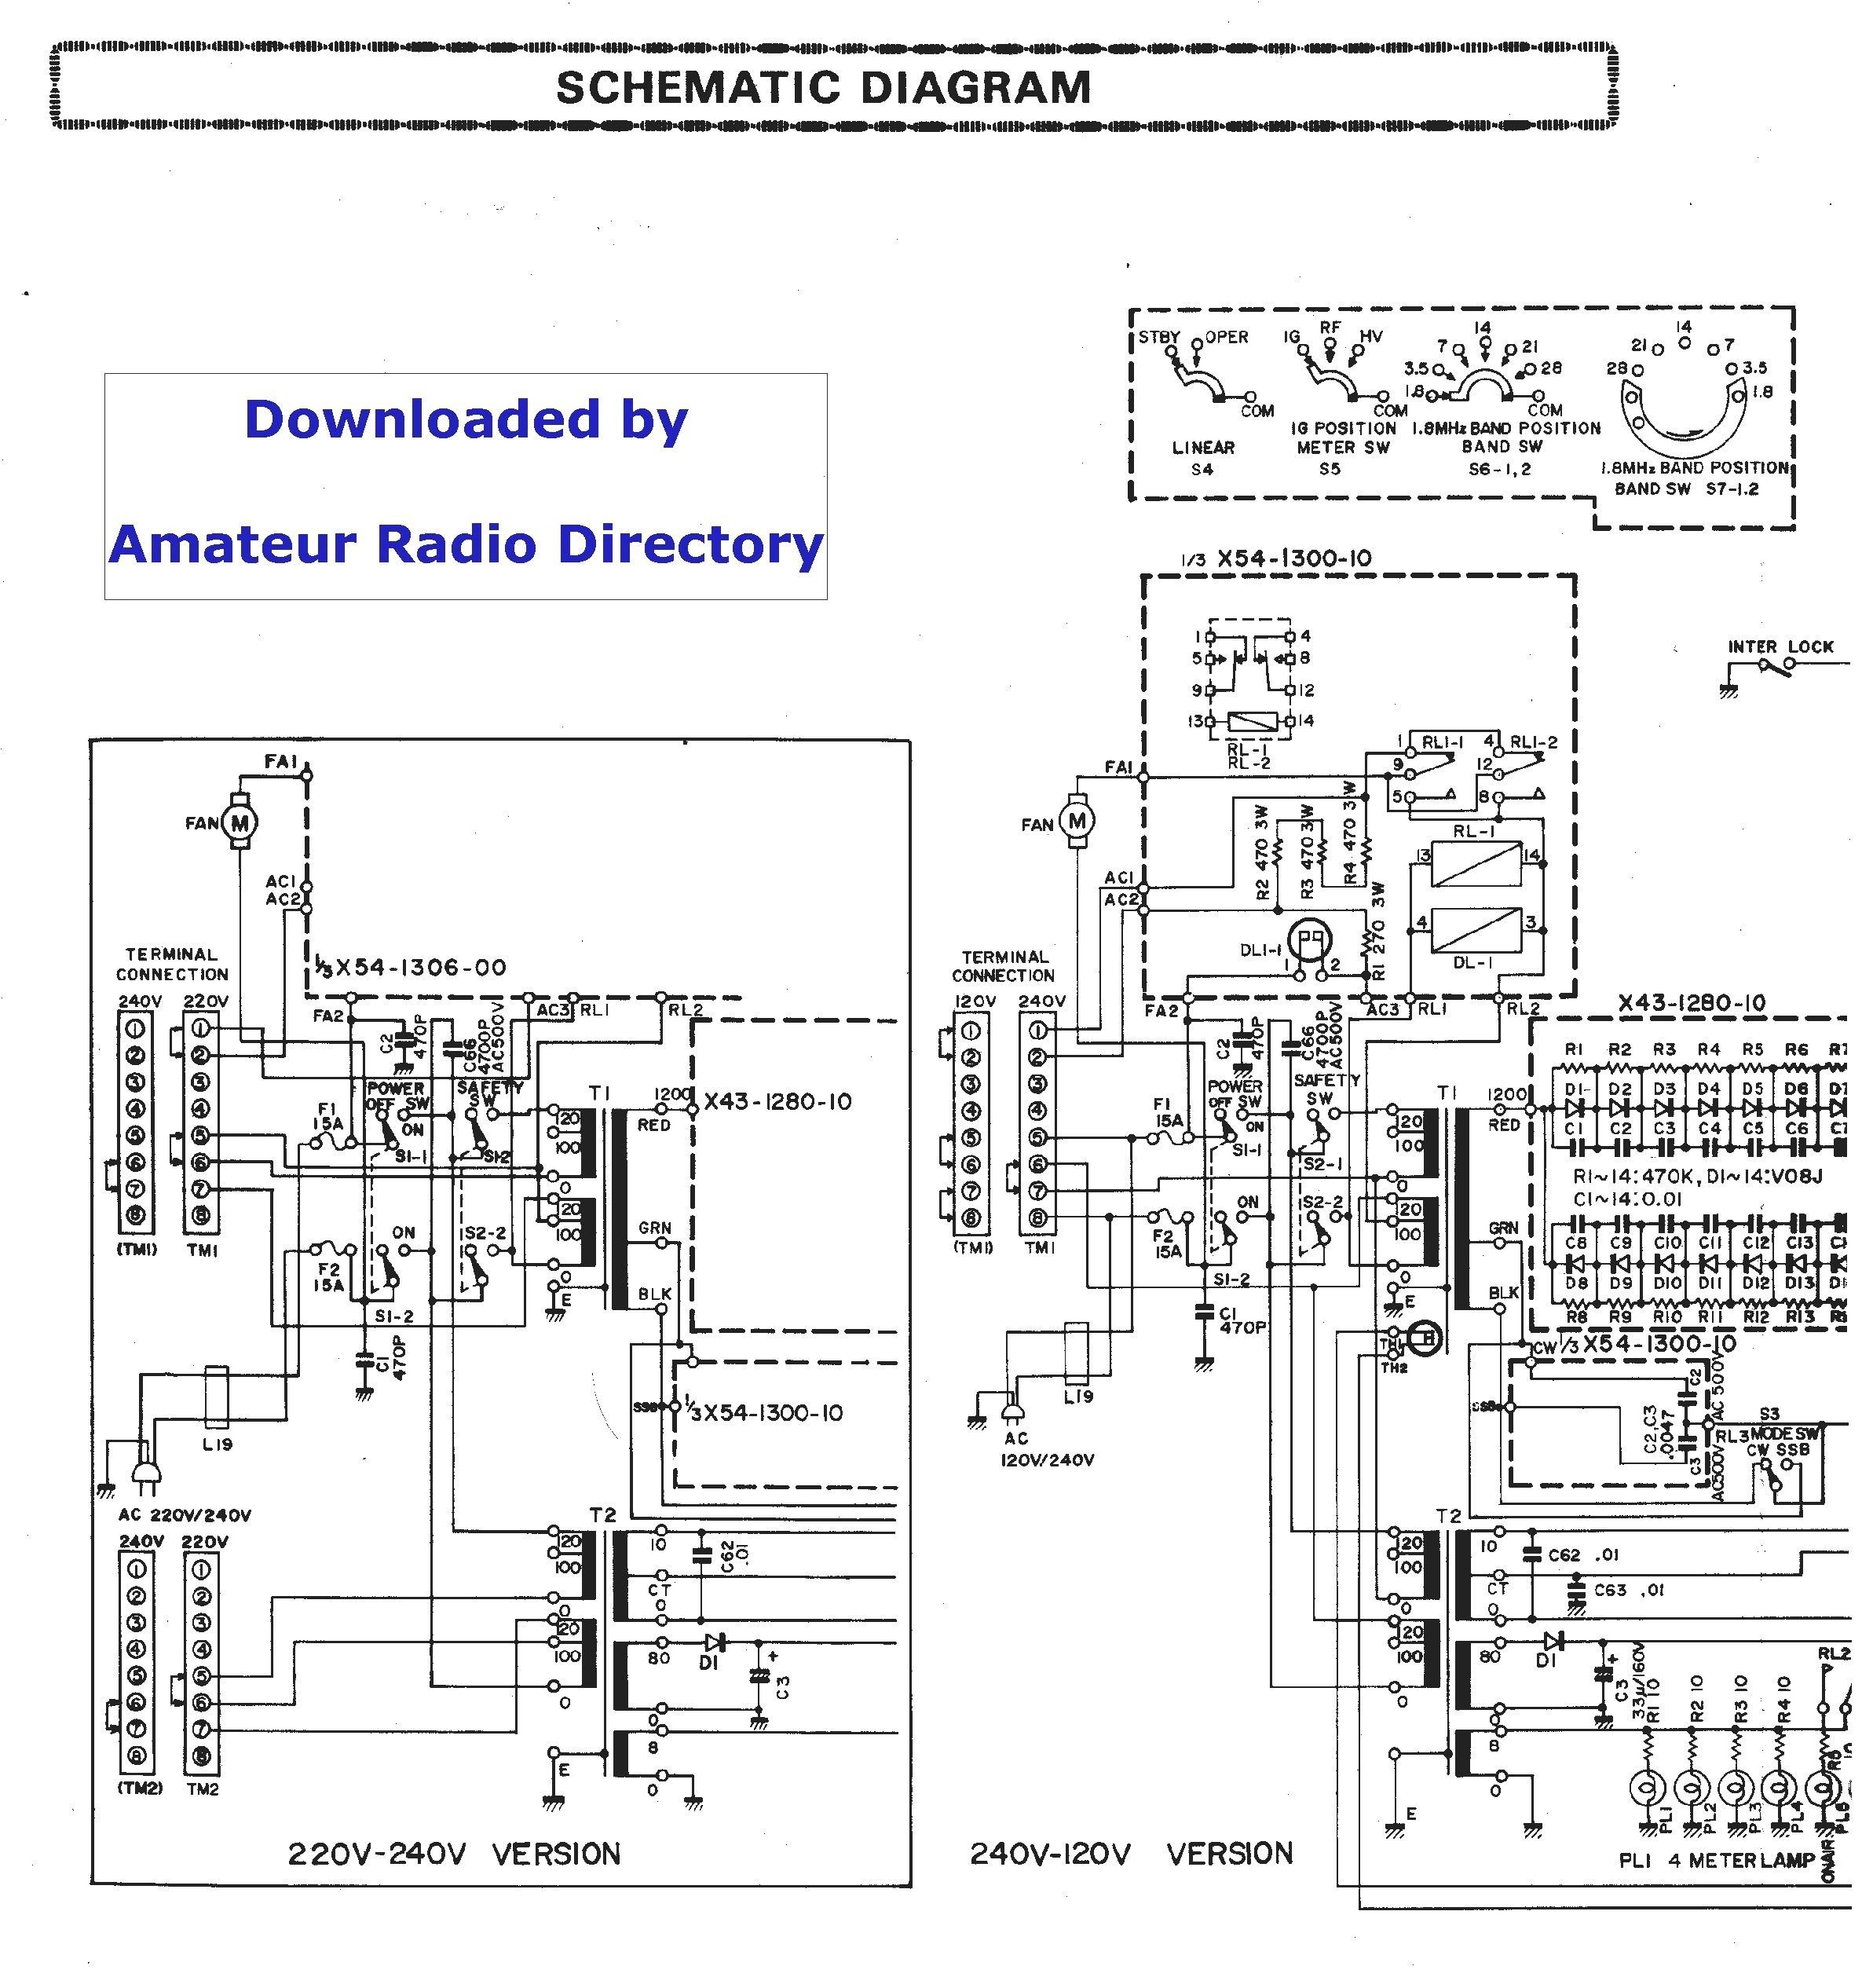 Wire Diagram Kenwood Kdc 210U | Manual E-Books - Kenwood Kdc 210U Wiring Diagram